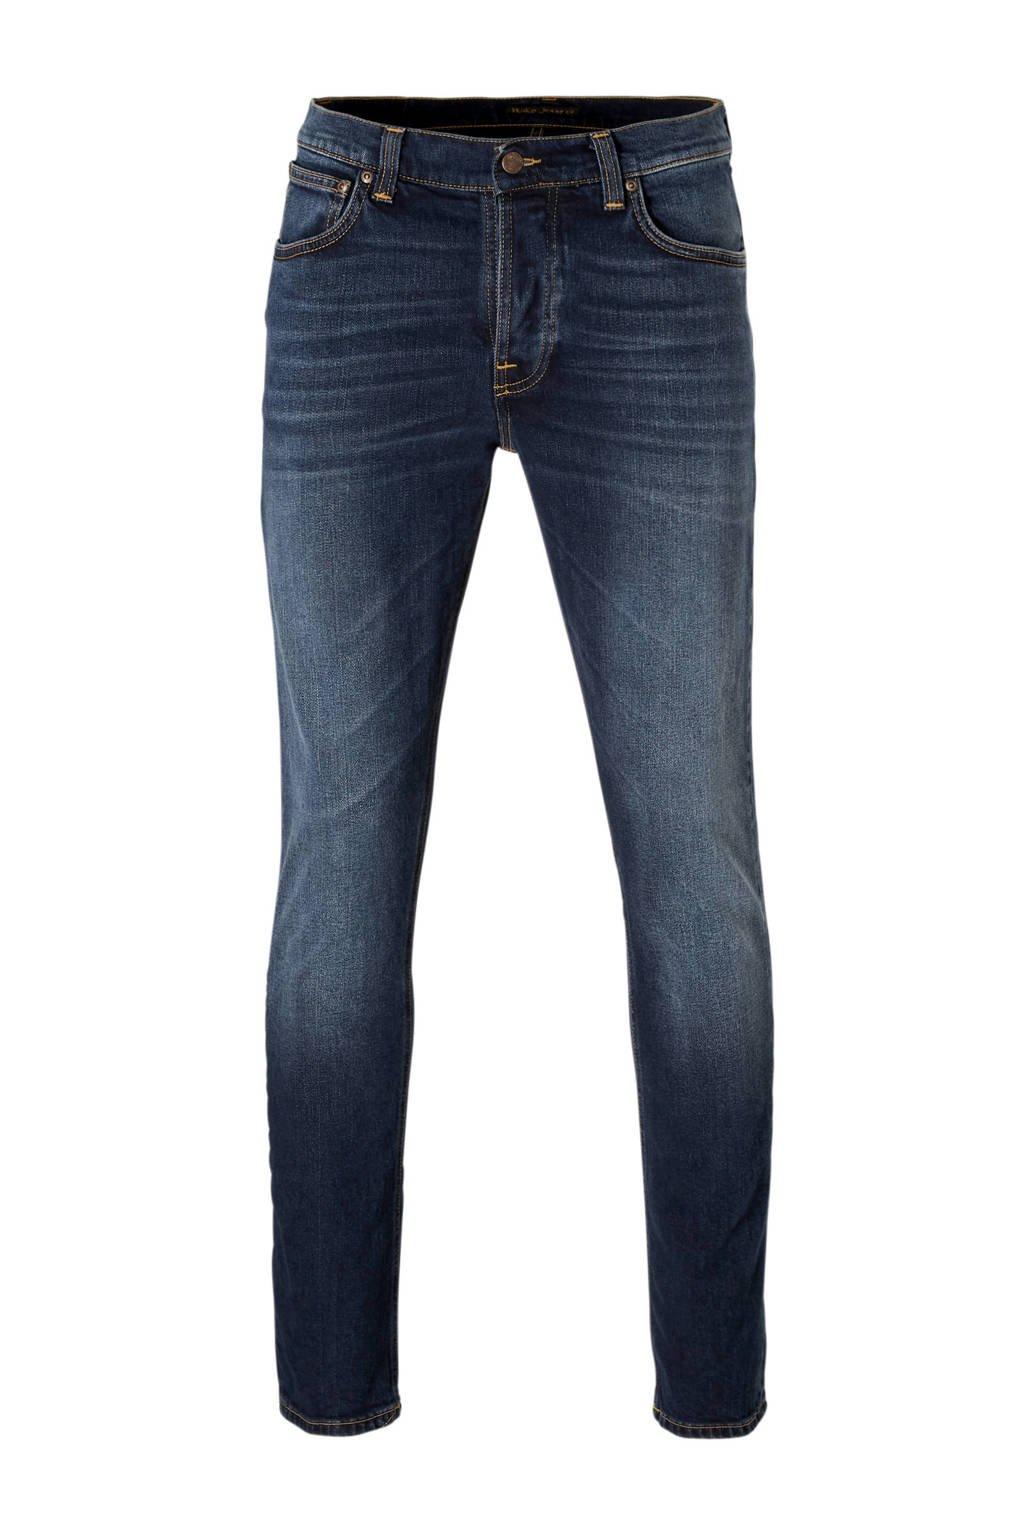 Nudie Jeans  regular Grim Tim jeans, Dark denim